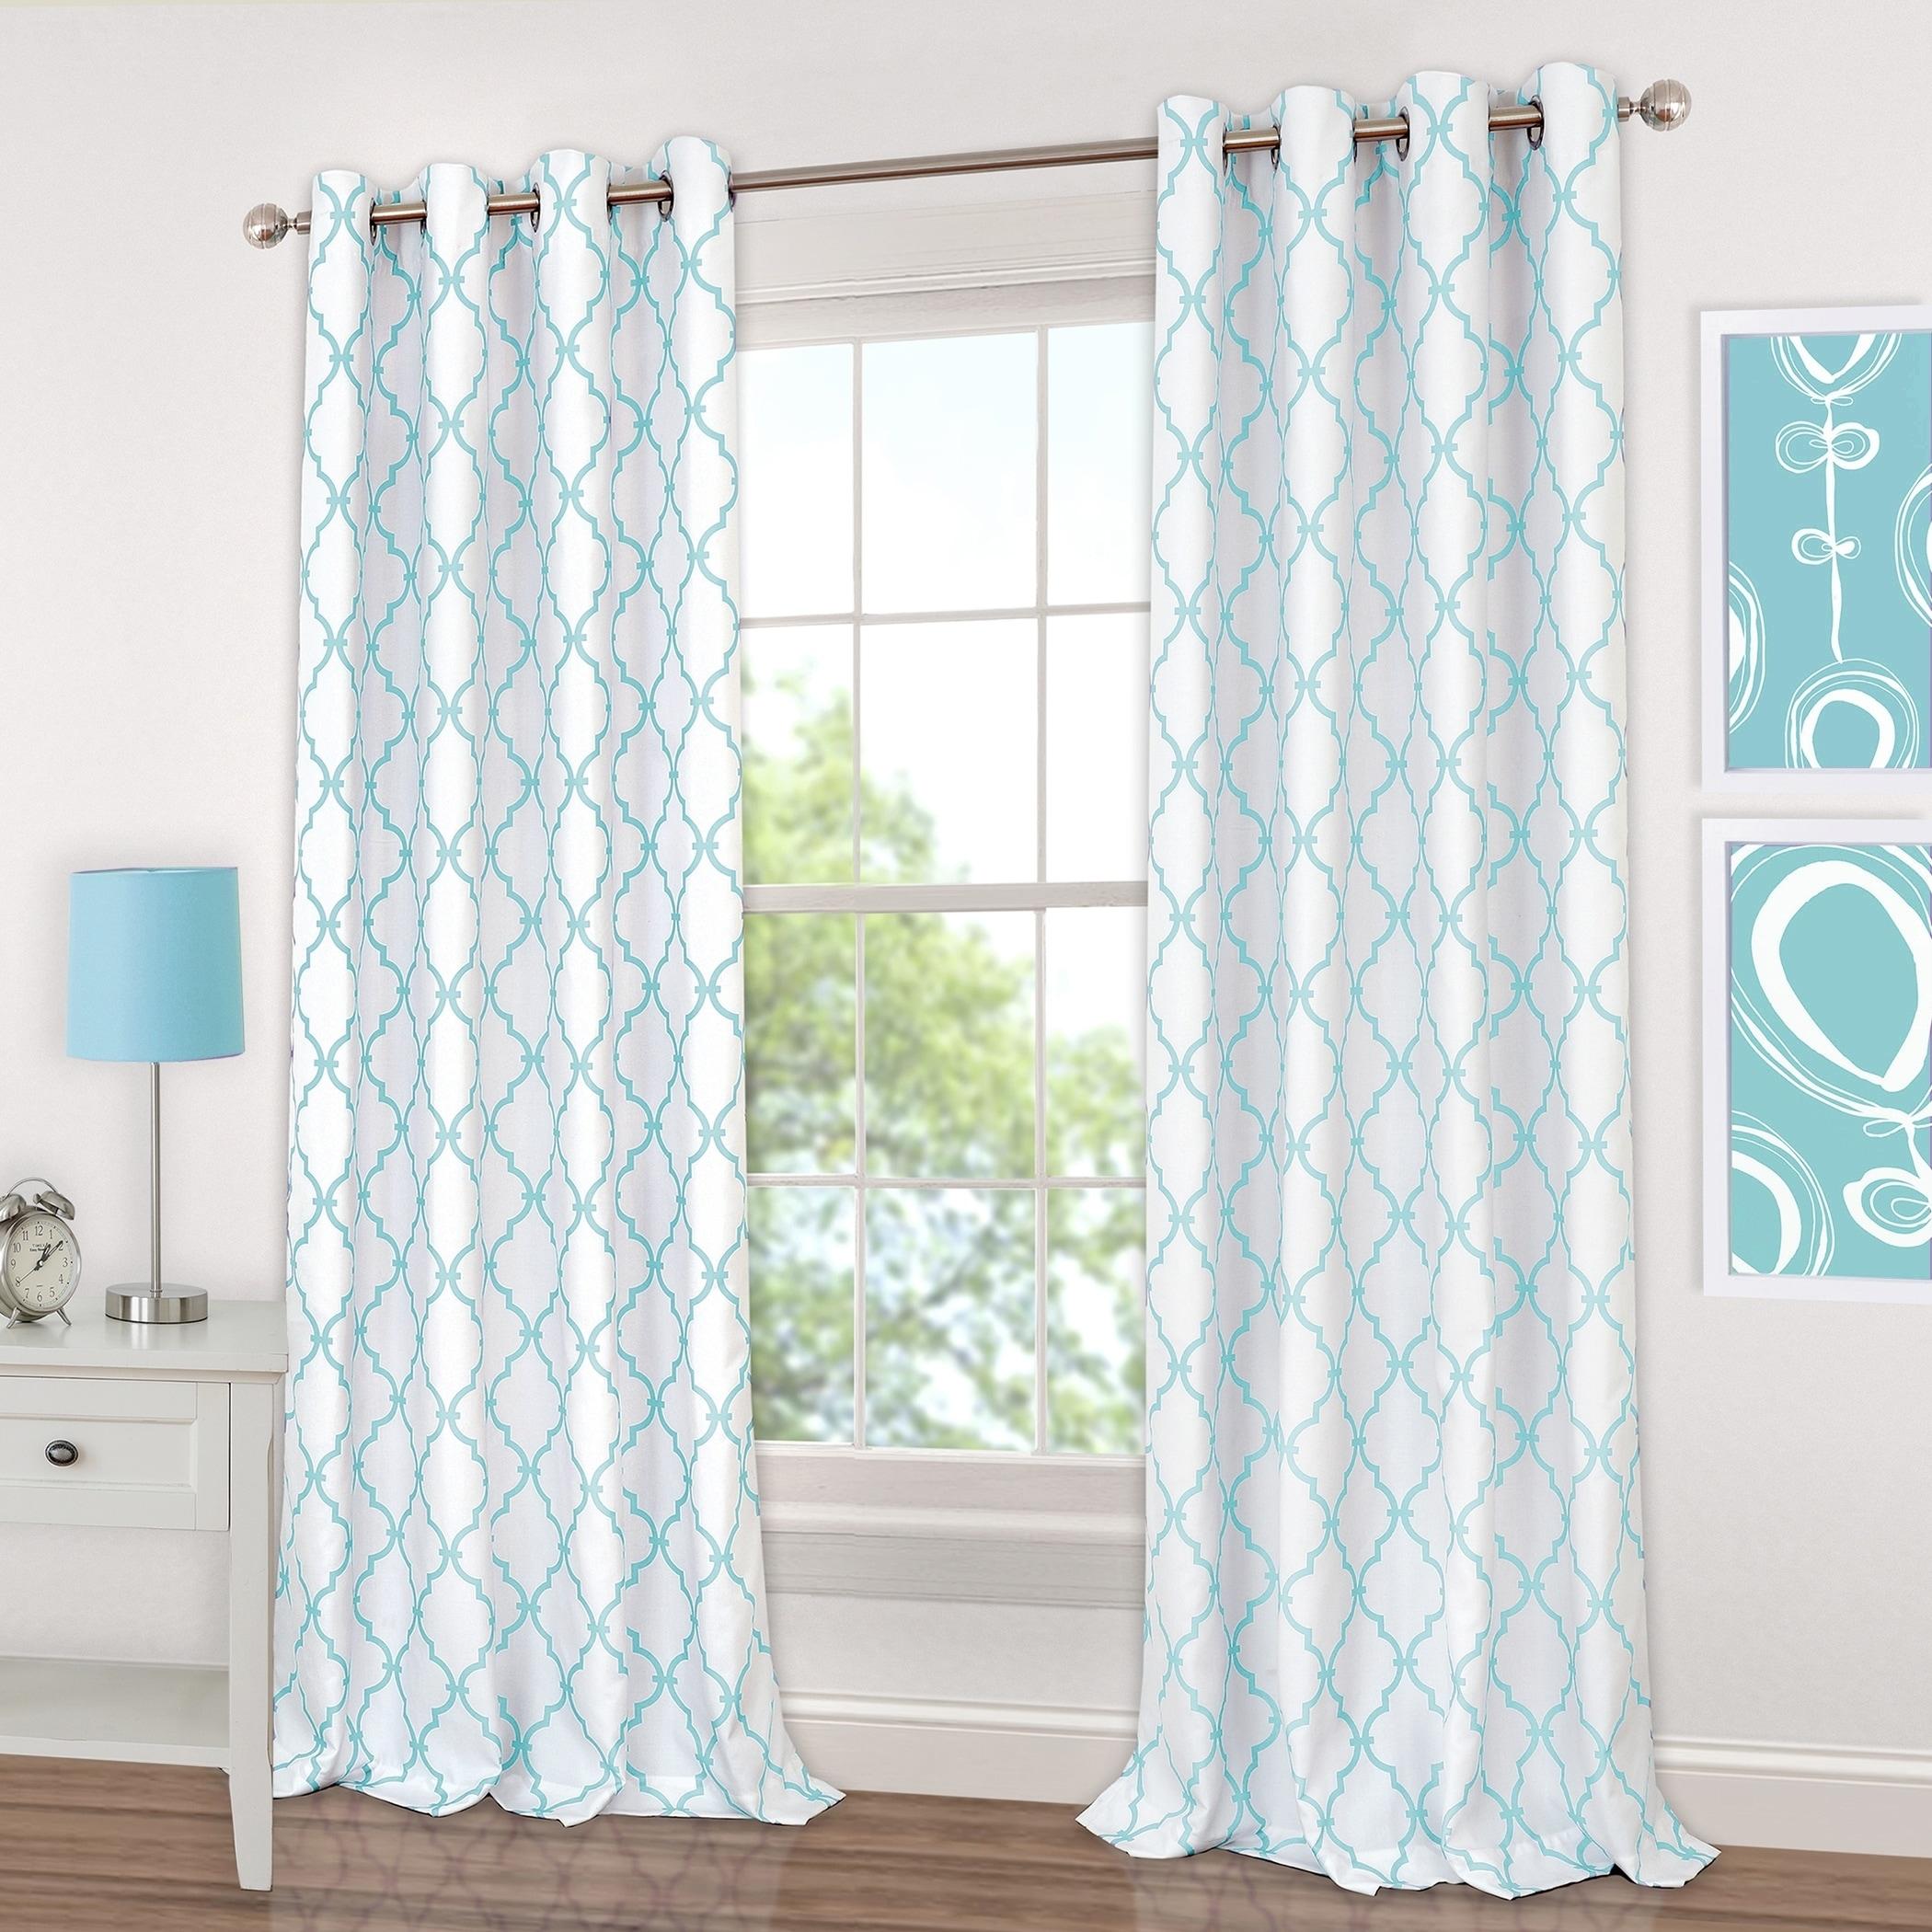 bathroom world charcoal elegant shower curtain chevron grey of teen market curtains dark